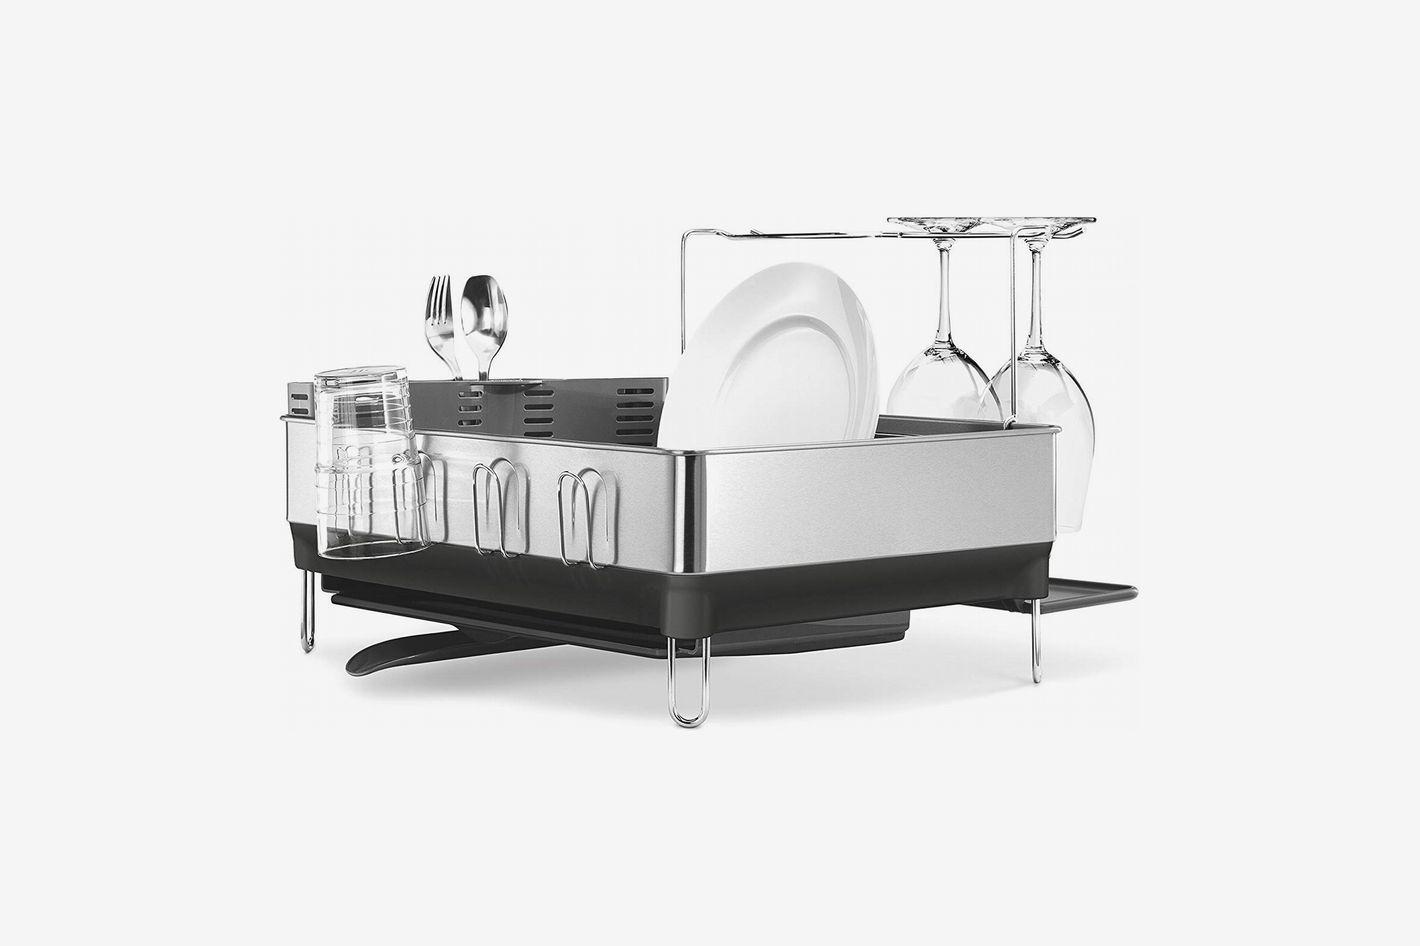 Simplehuman Steel Frame Dish Rack With Wine Glass Holder, Fingerprint-Proof Stainless Steel, Gray